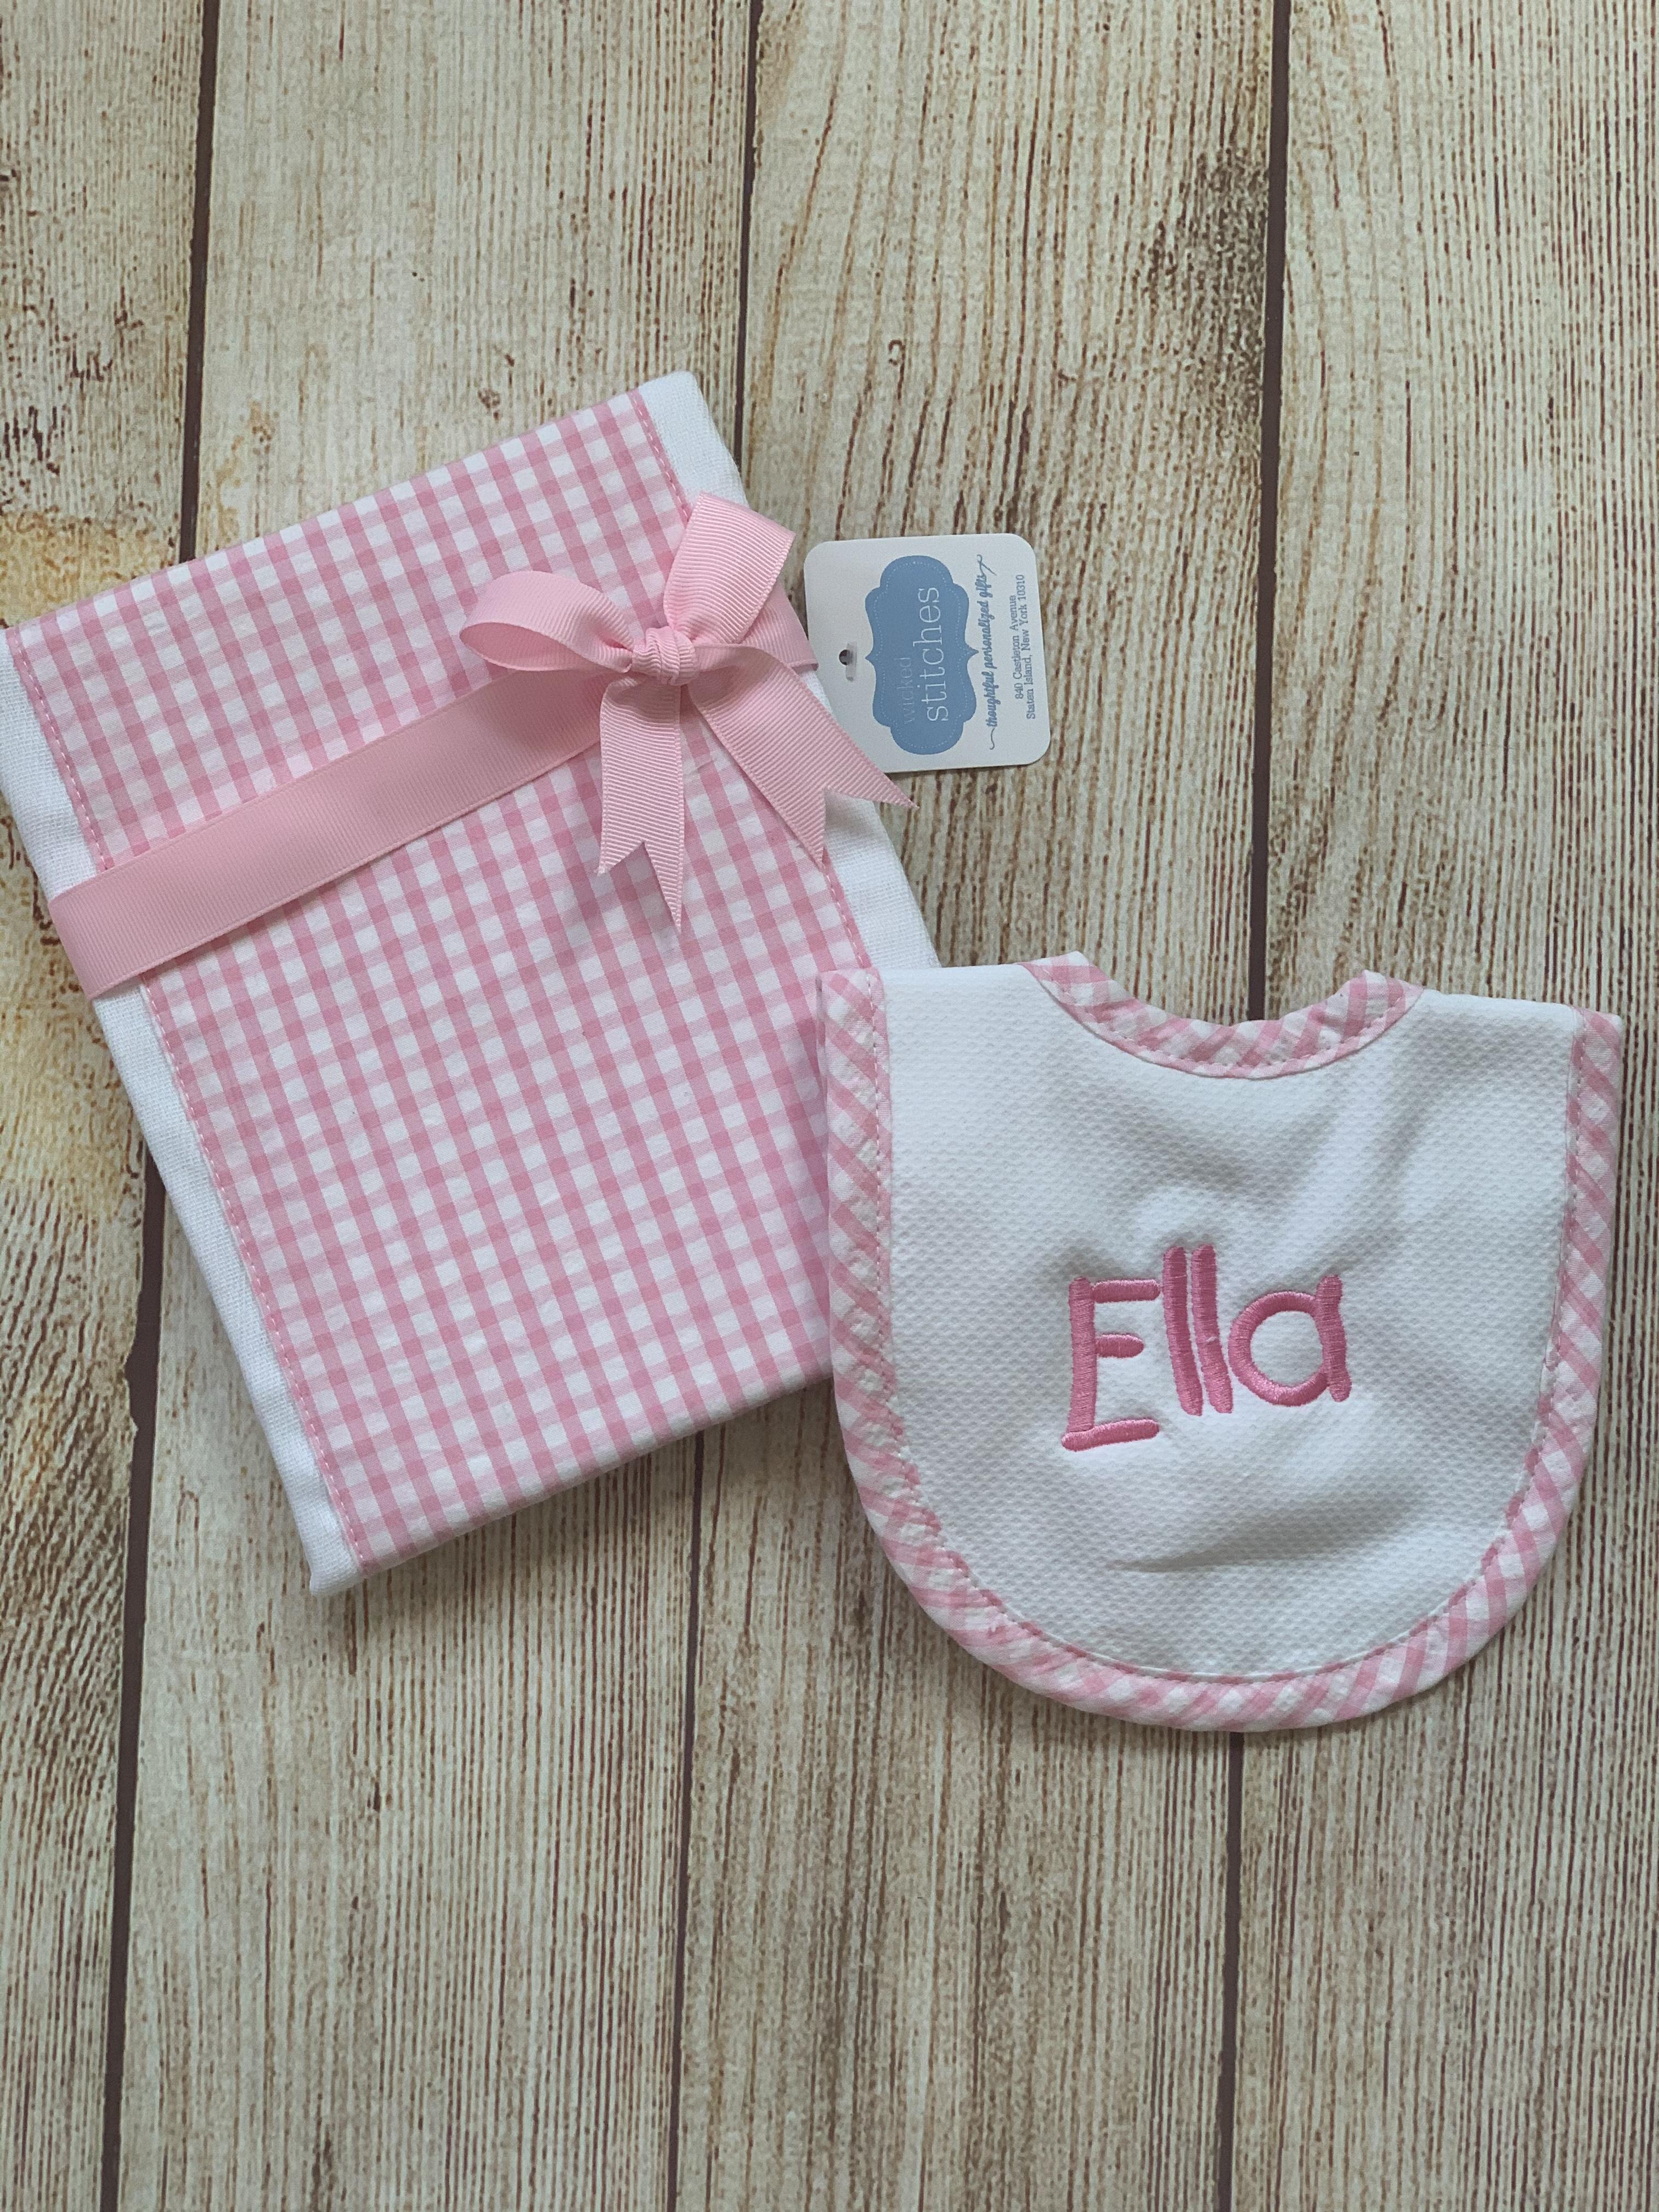 Newborn Feeder Bib and Burp Cloth set by Wicked Stitches Gifts